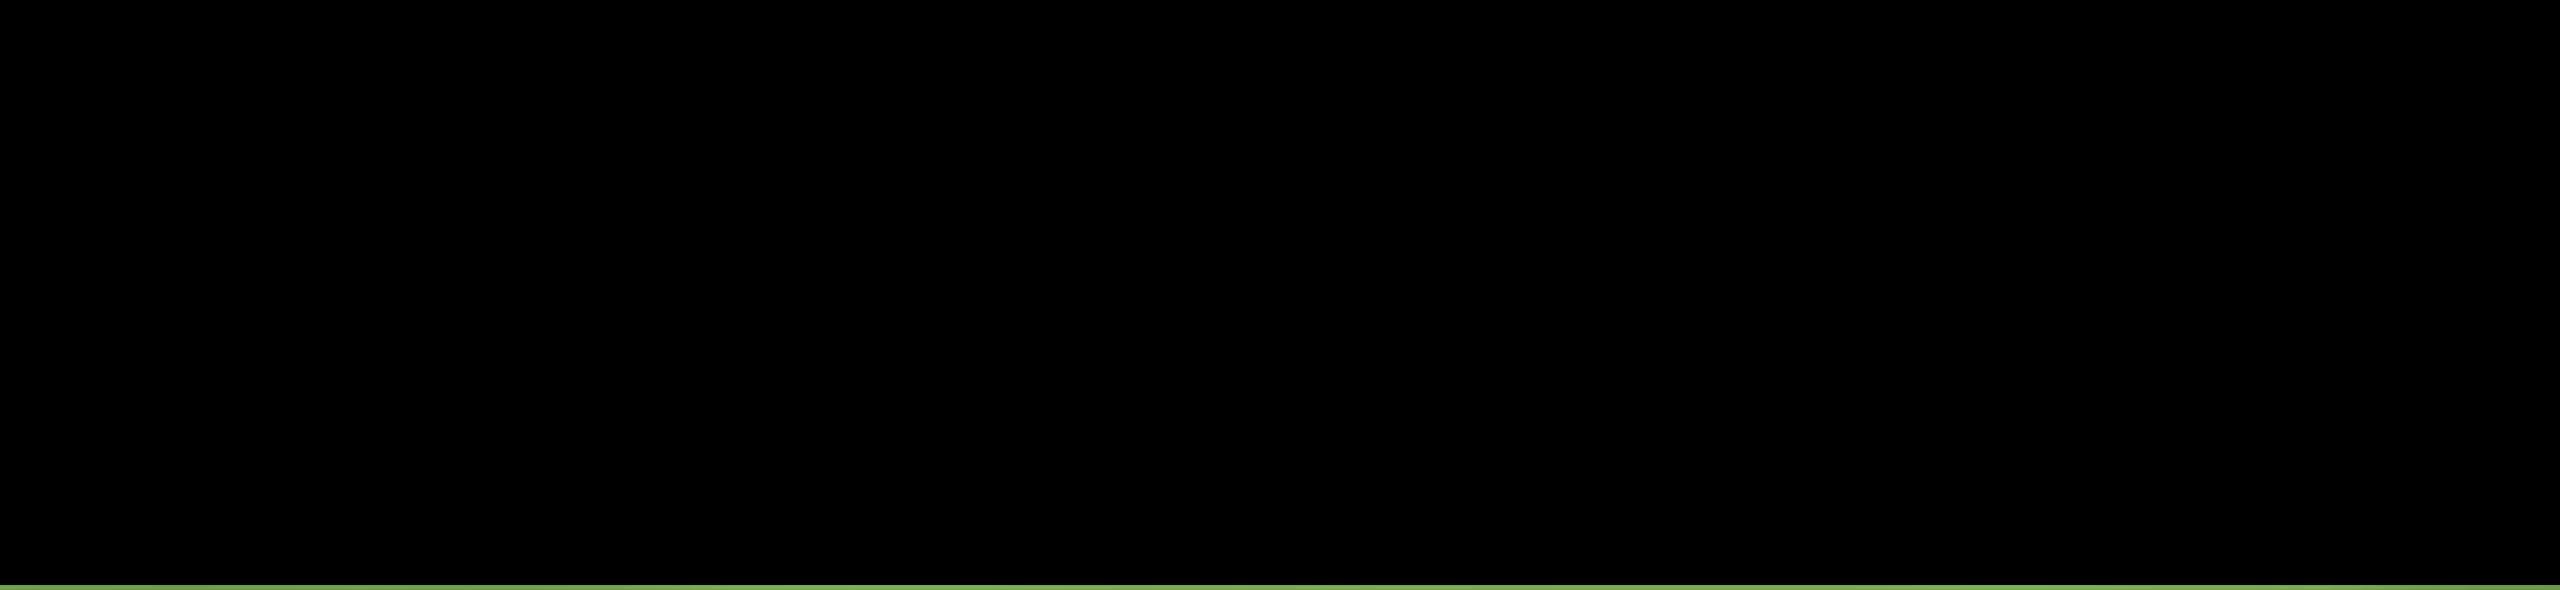 9760131_4091671fond-slide-biosmoz